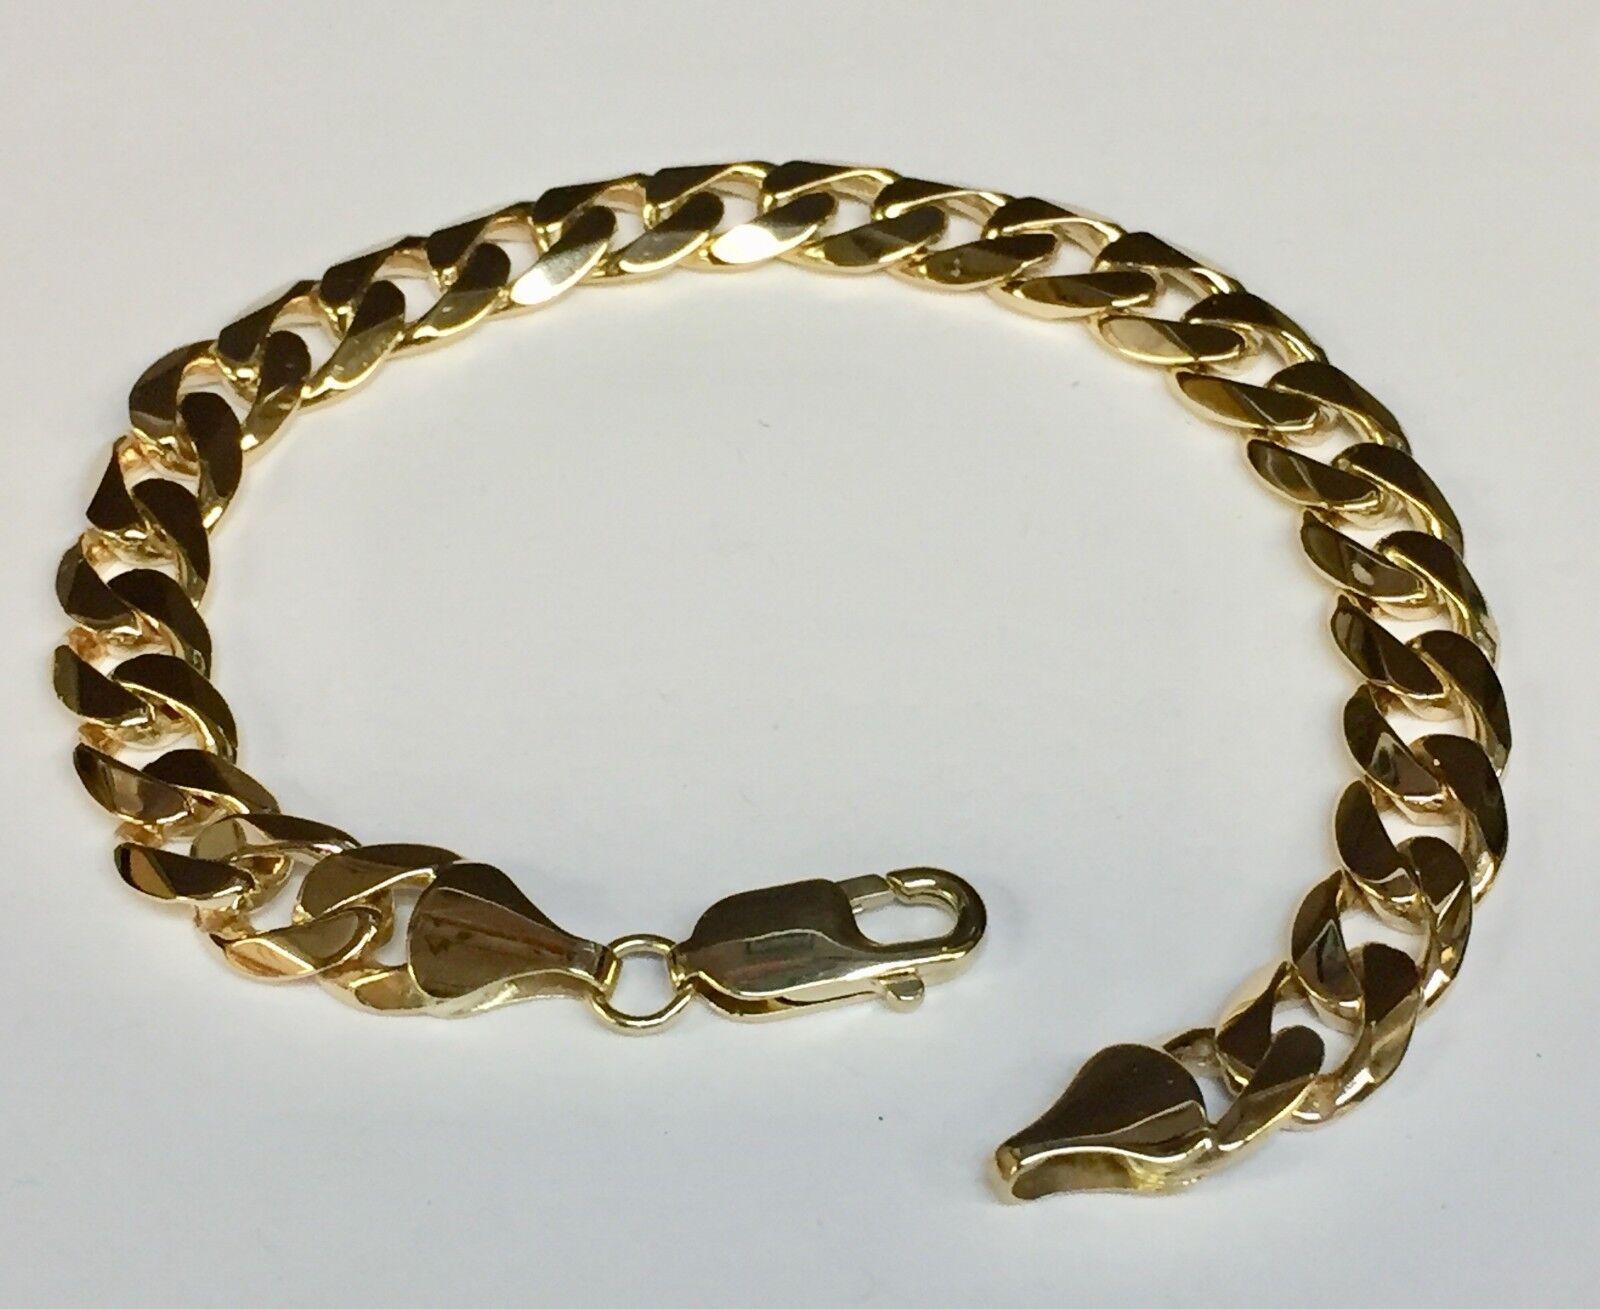 10kt Solid Yellow gold Handmade Curb Link Mens Bracelet 7.5  24 Grams 9MM